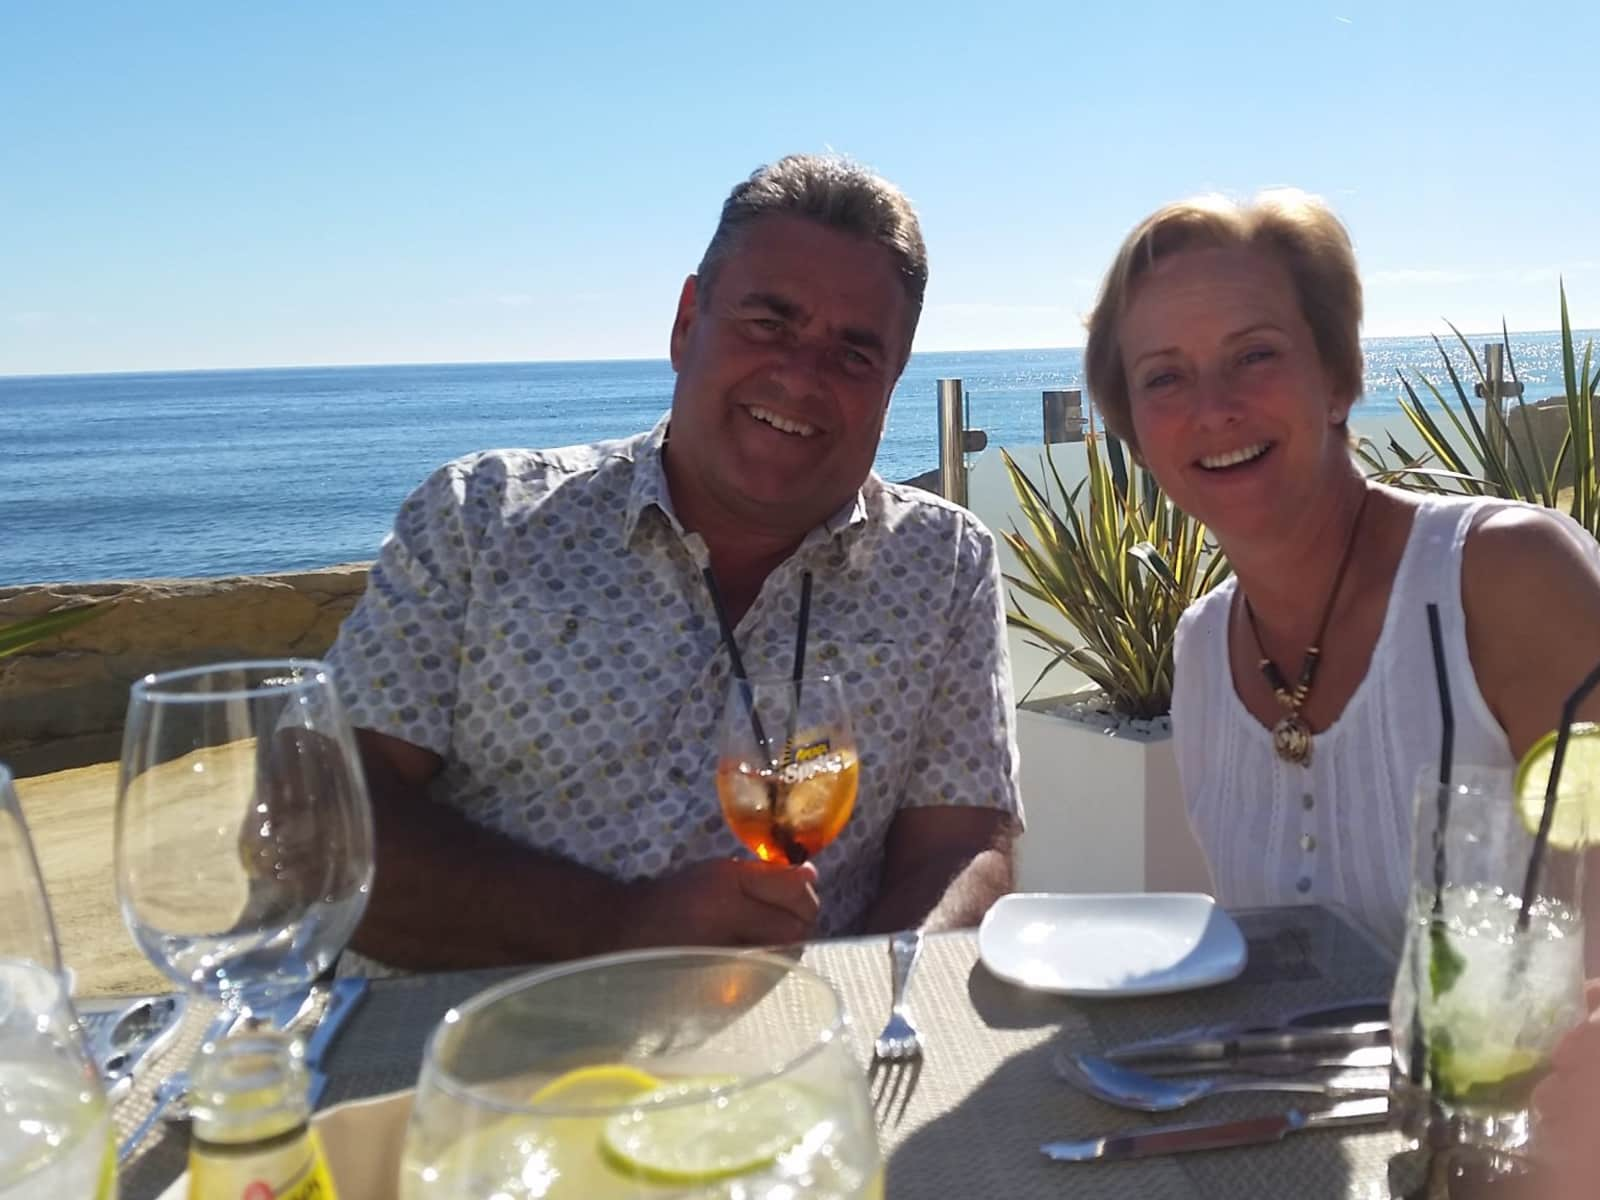 Gillian & Derek from Mijas, Spain